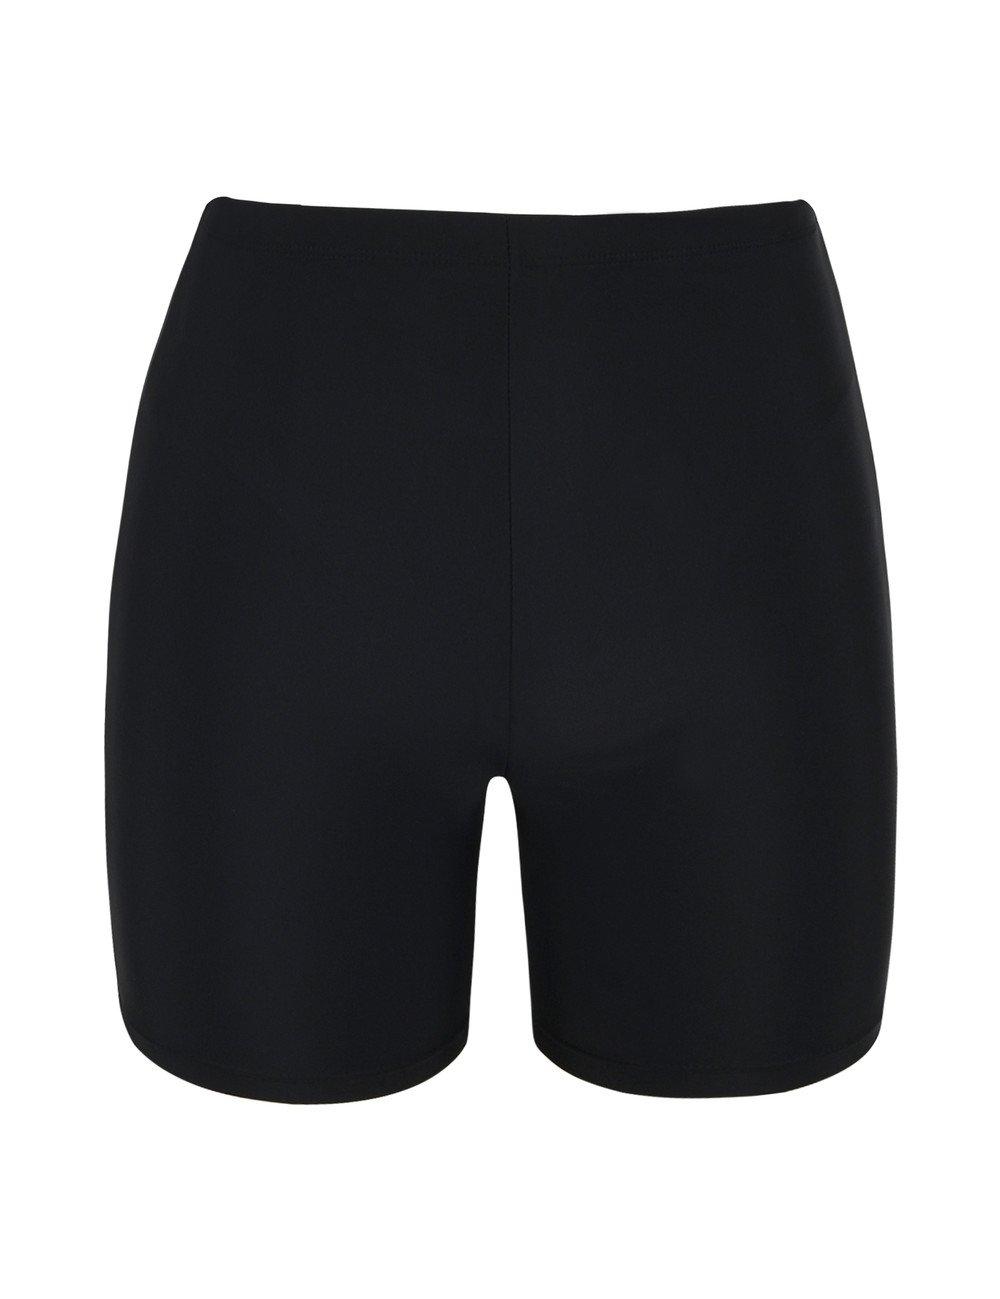 Firpearl Women's Board Shorts UPF50+ Sport Surf Shorts Swimsuit Bottom Swim Shorts Black US24